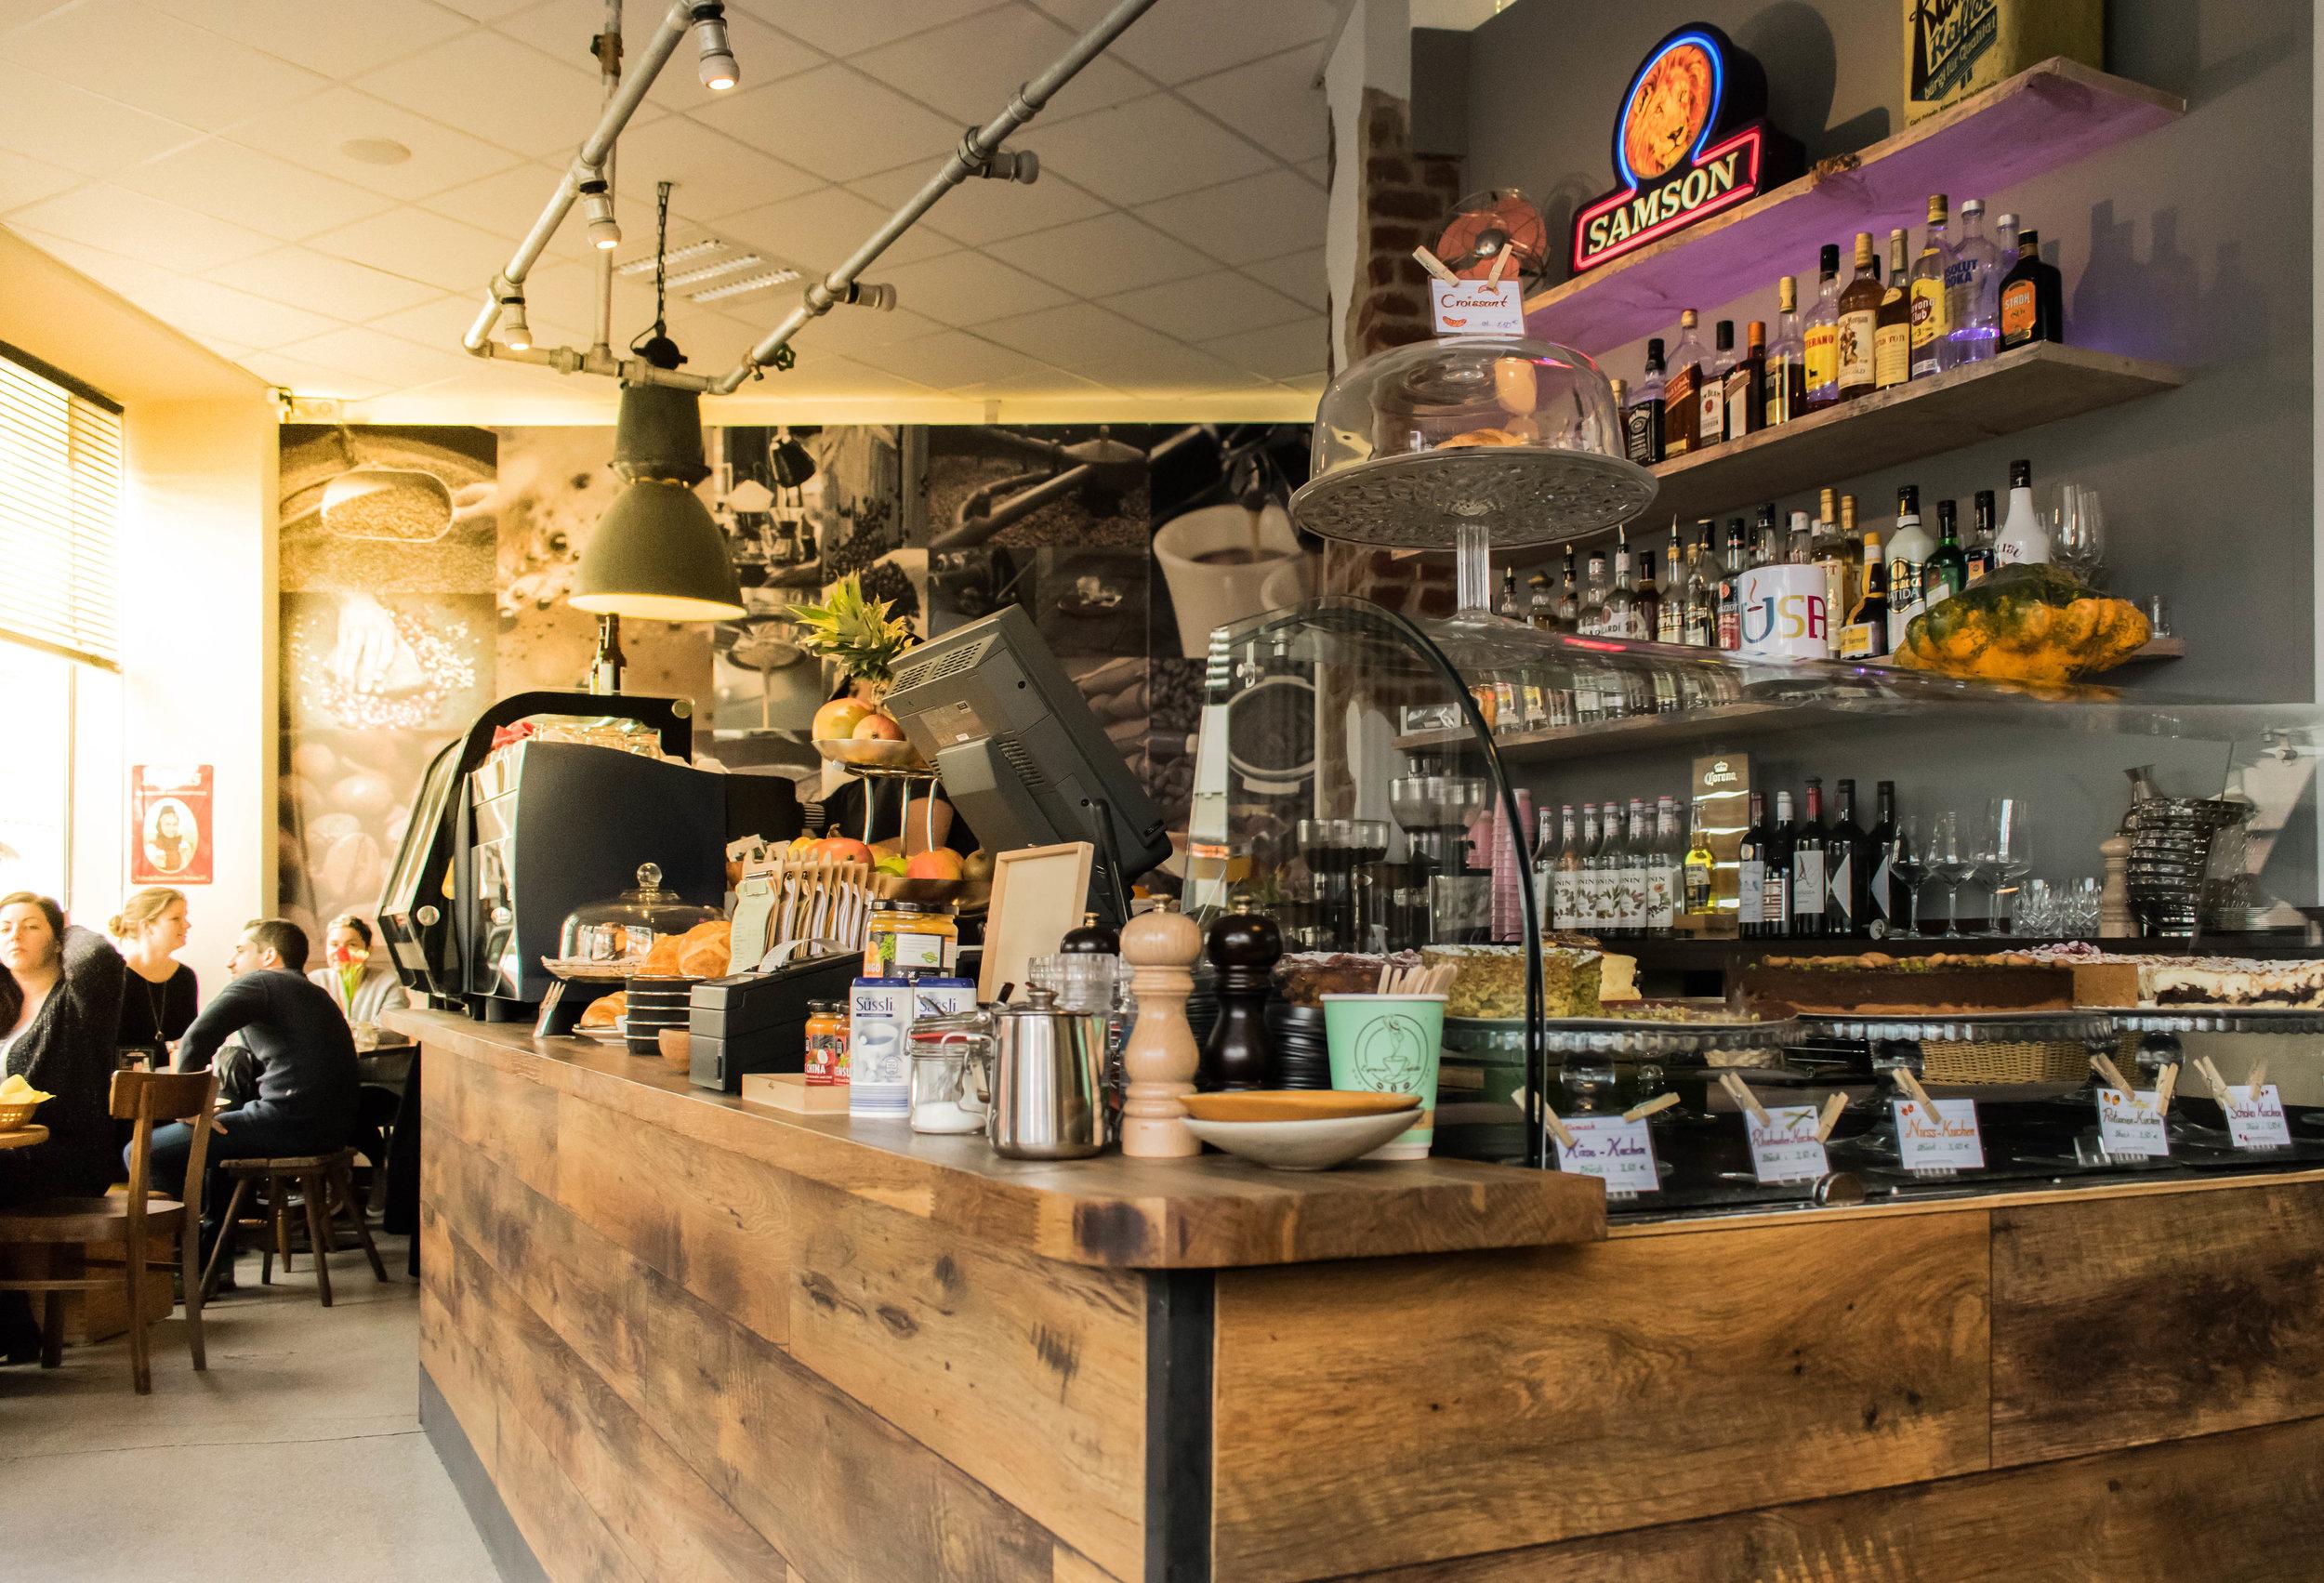 Kausal-Kaffee-Flingern-Dusseldorf-Brown-Leather-Book